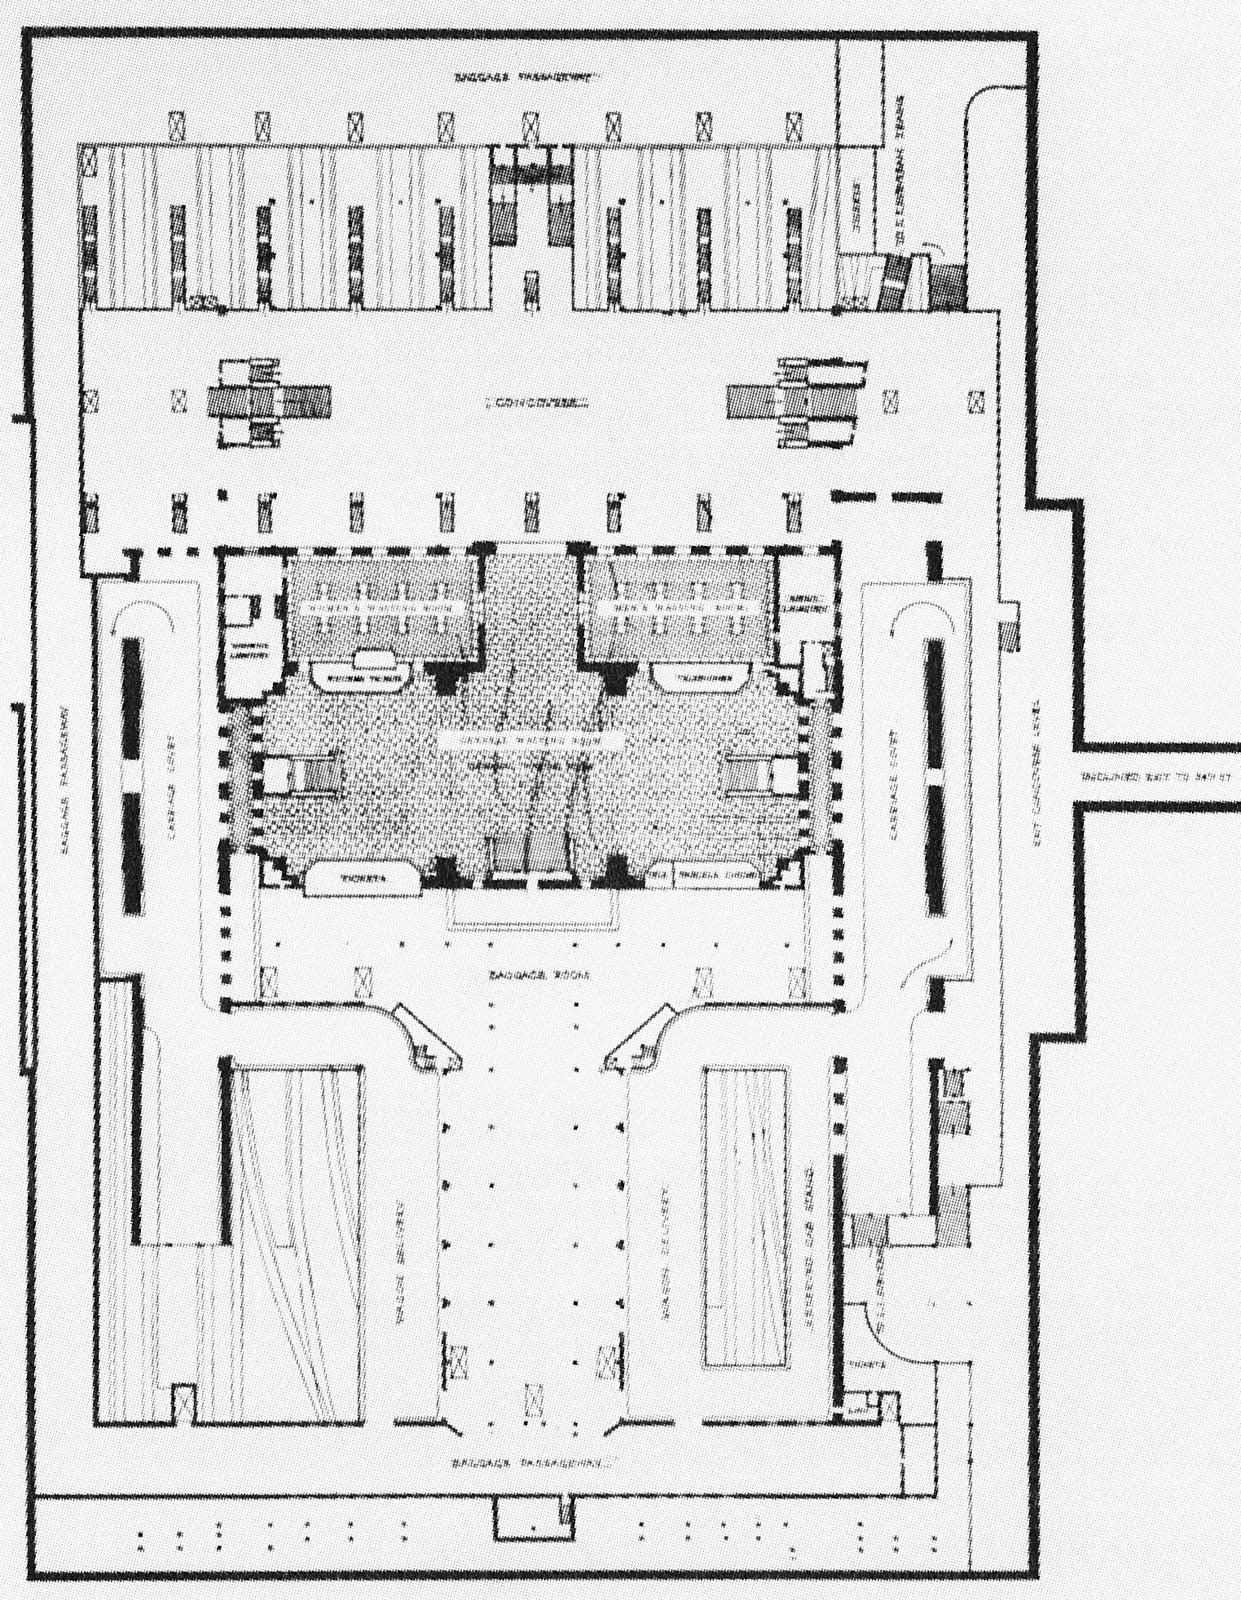 Penn Station Pathfinder Historic Floorplans